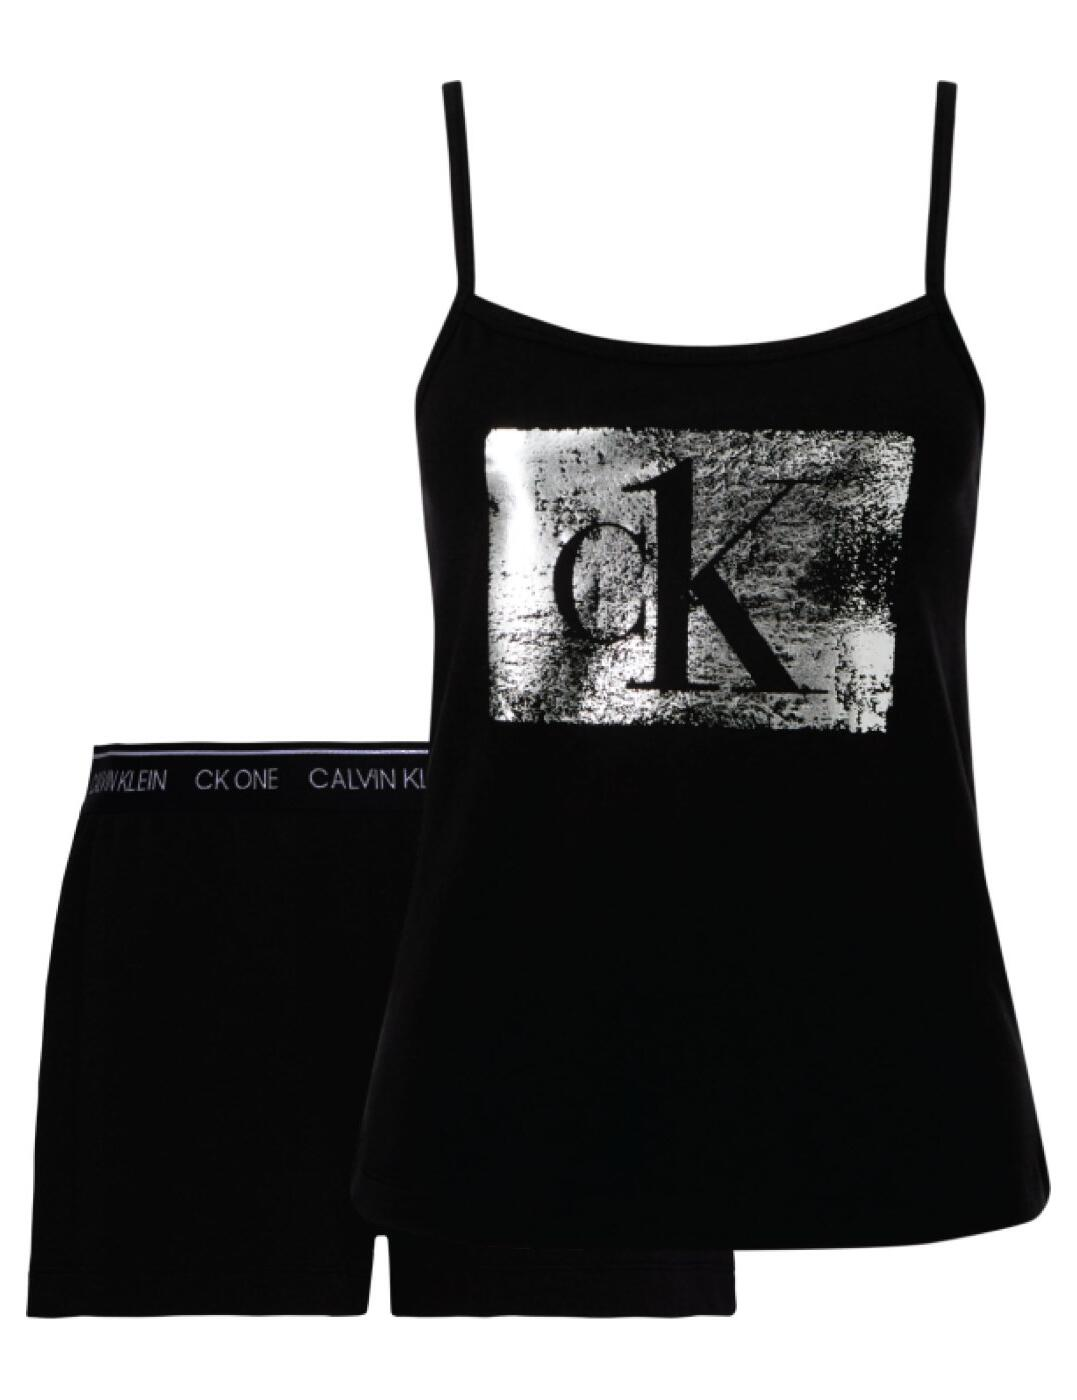 000QS6603E Calvin Klein Shorts Pyjama Set  - QS6603E Black/Silver Foil